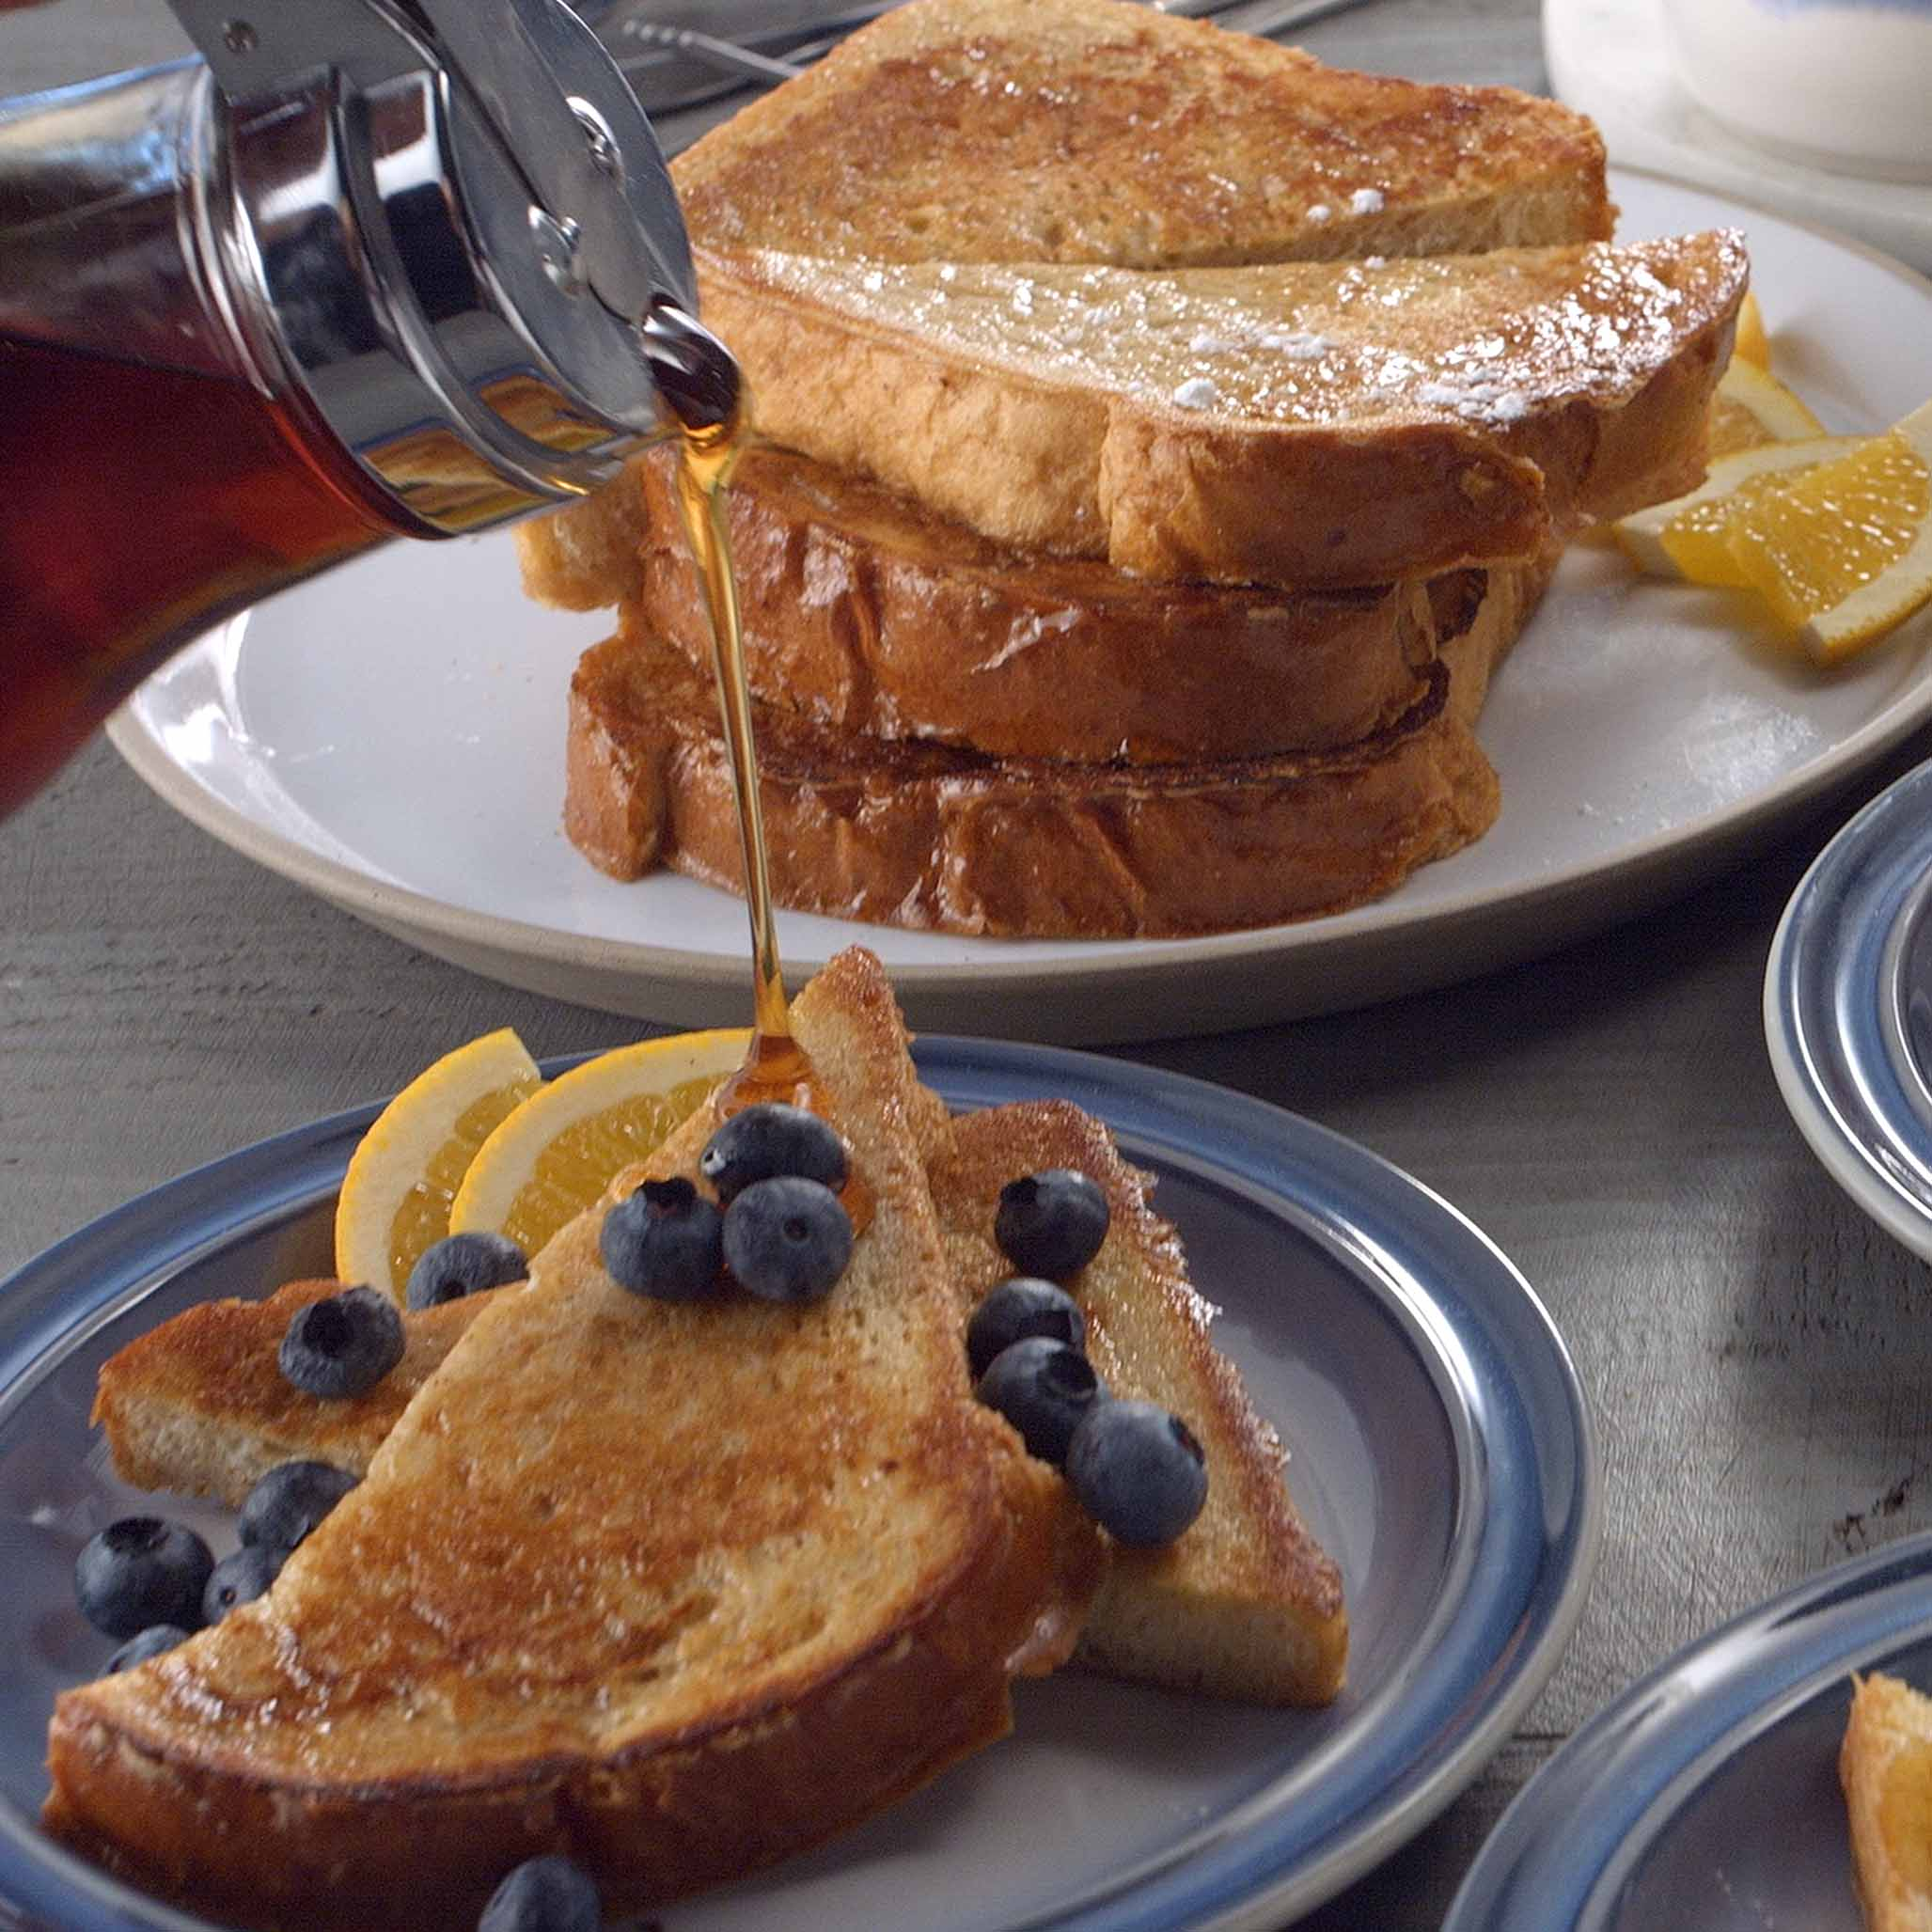 Photo of Eggnog French toast by WW